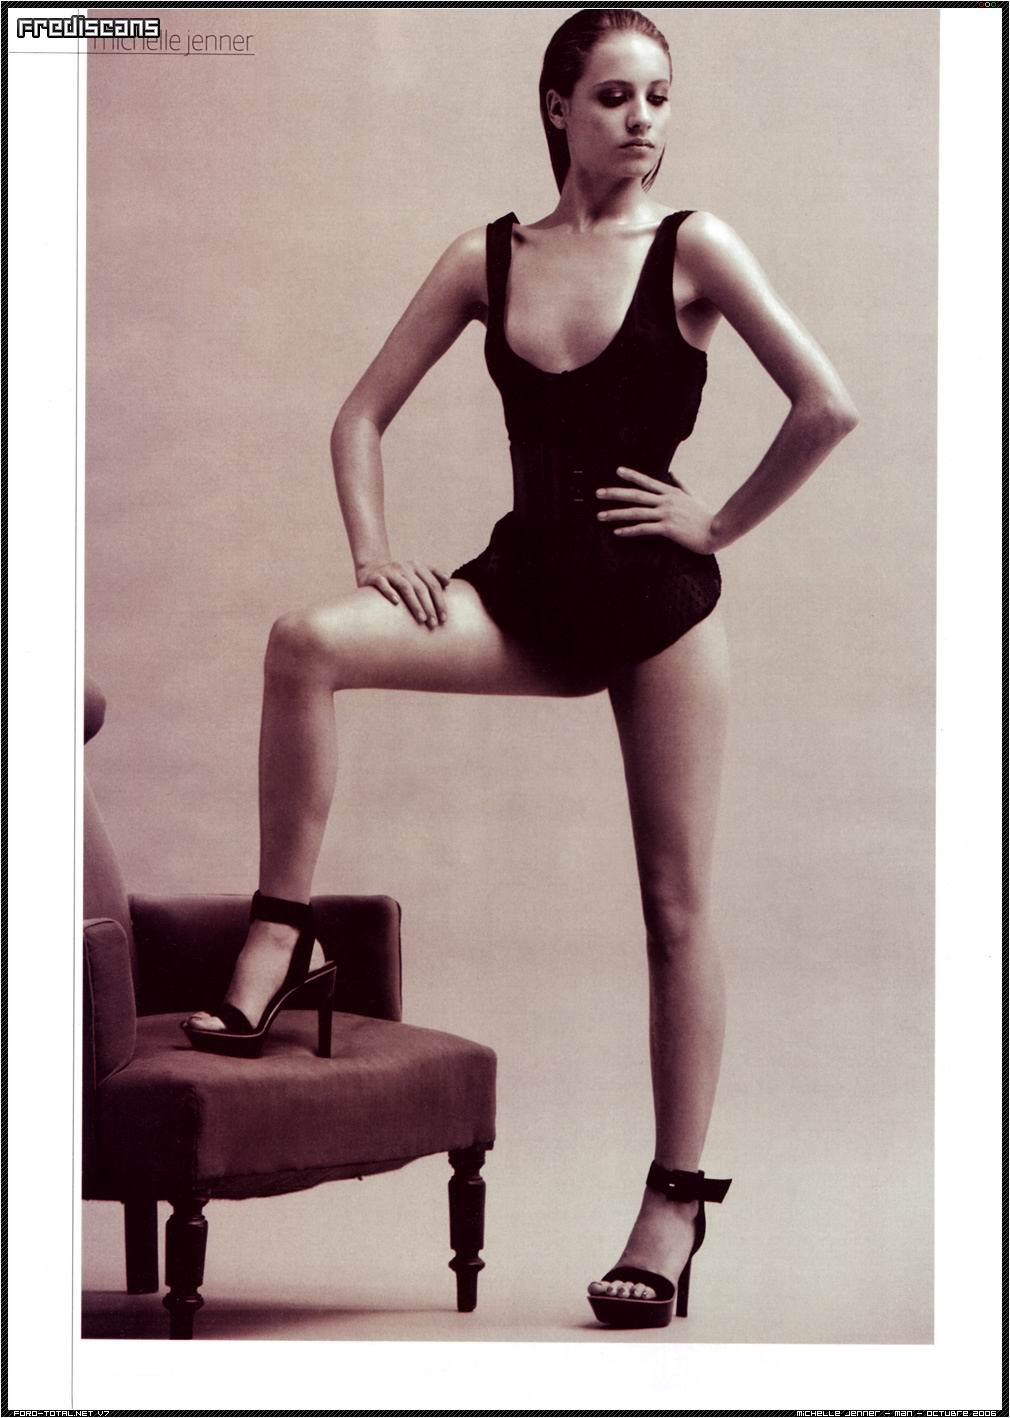 Michelle Jenner famosas desnudas fotos